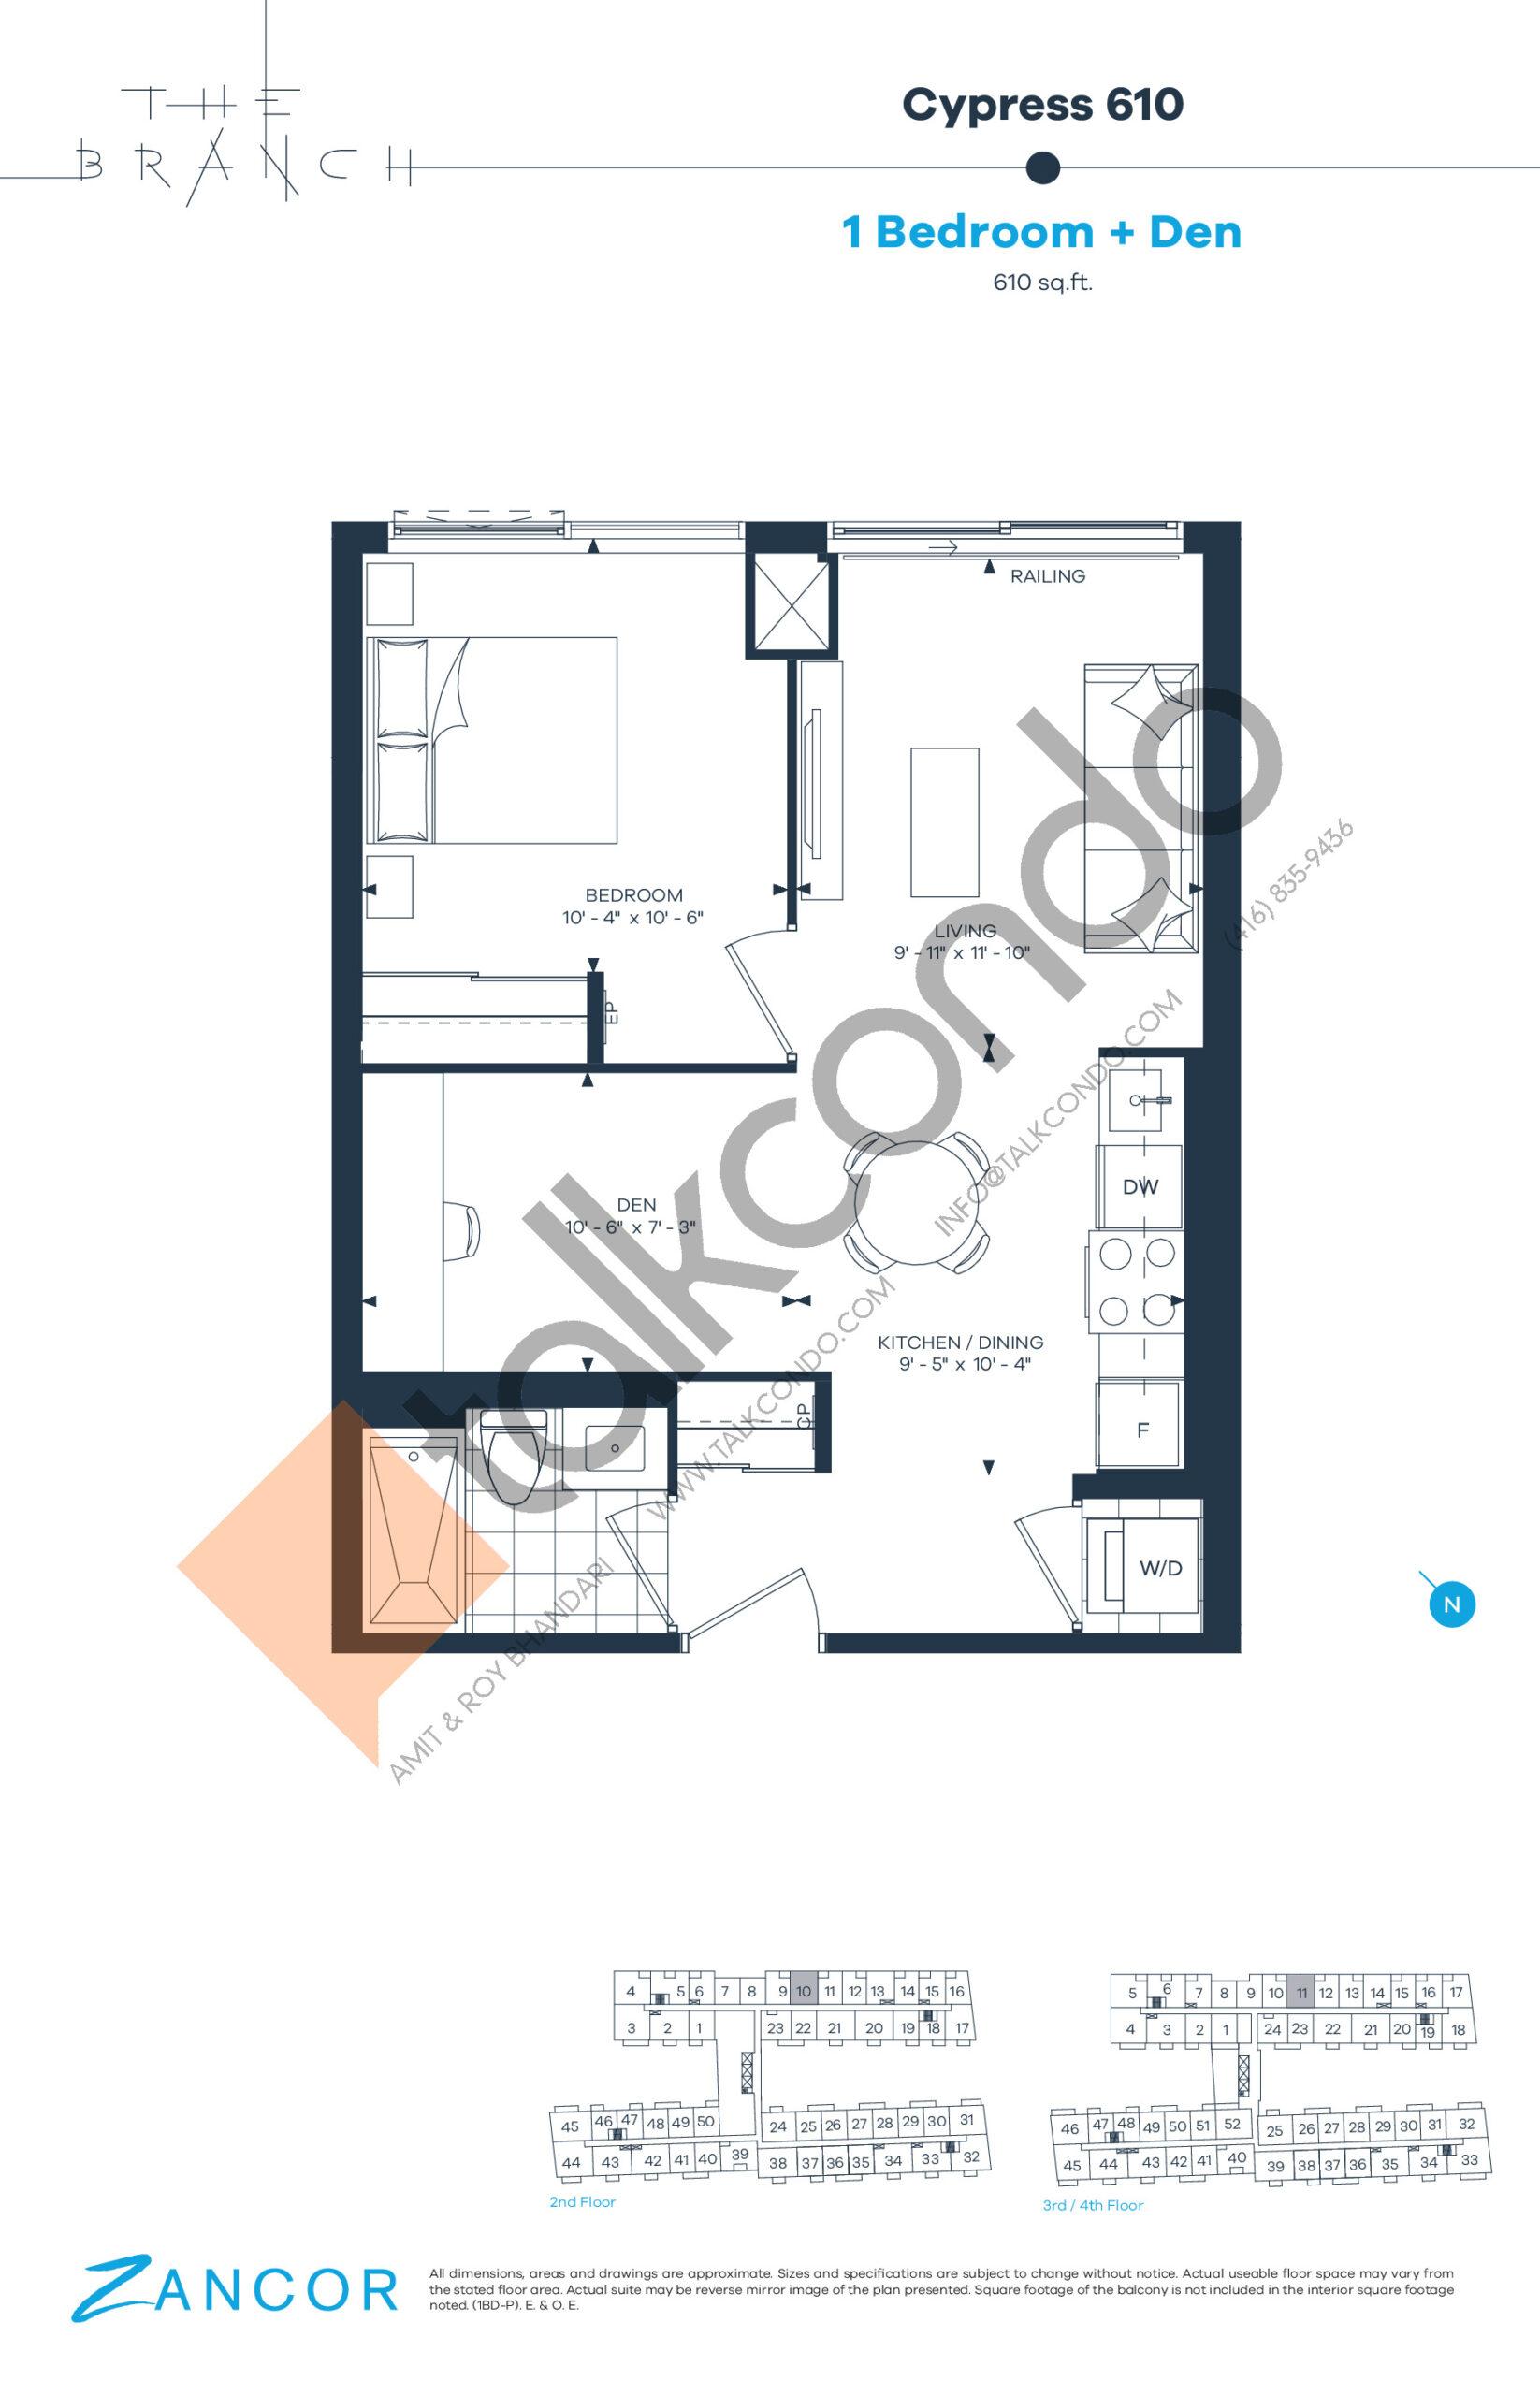 Cypress 610 Floor Plan at The Branch Condos - 610 sq.ft